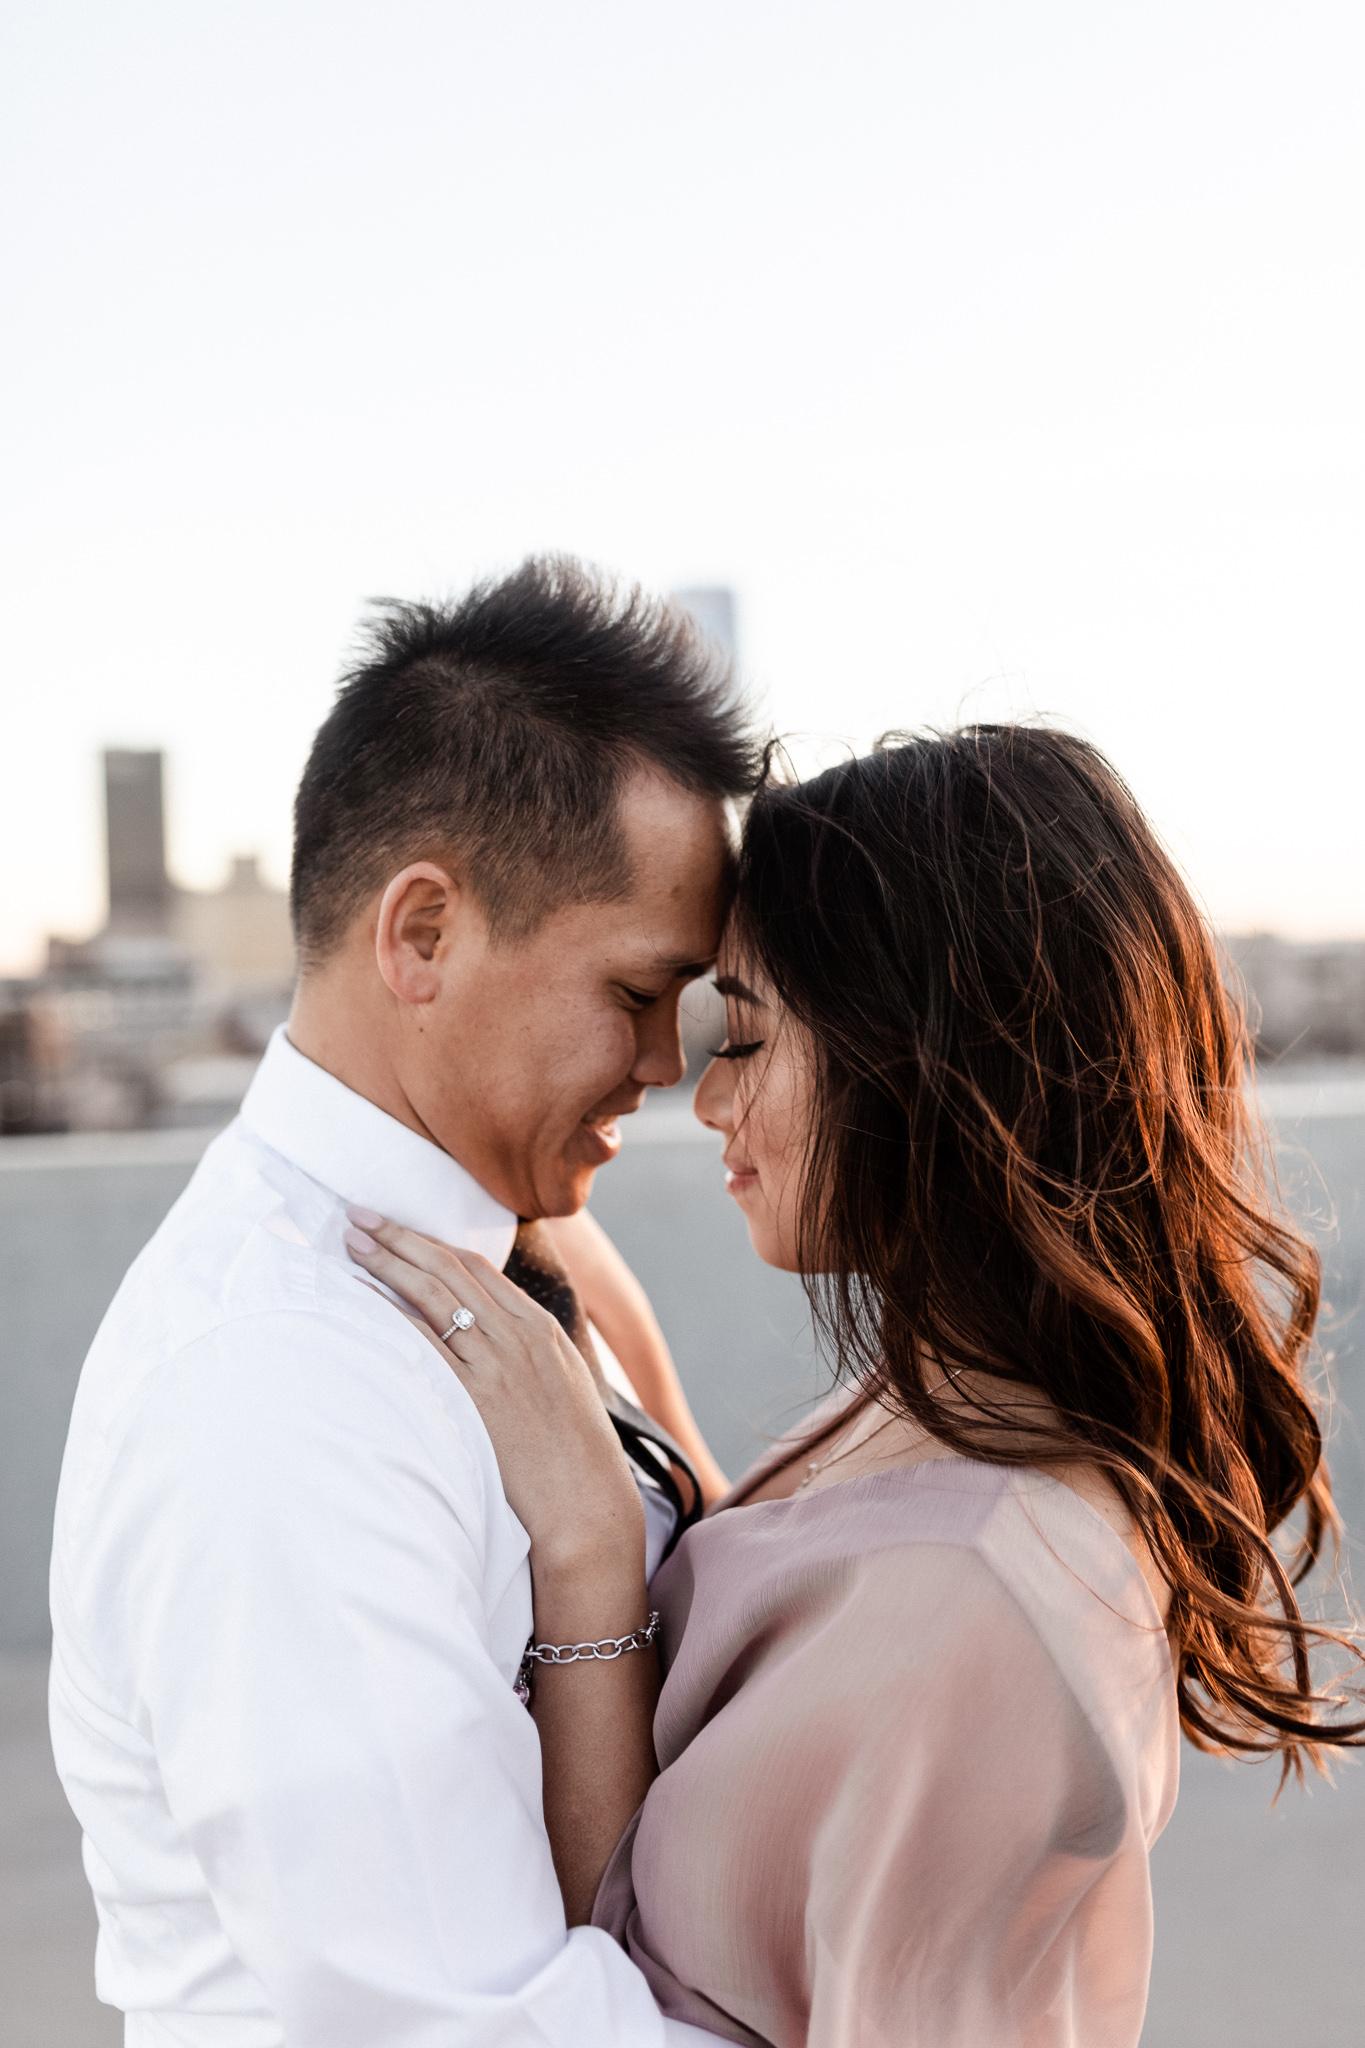 Hieu + Teresa | Colorful Romantic Downtown Engagements | Oklahoma Wedding Photographer-60.jpg